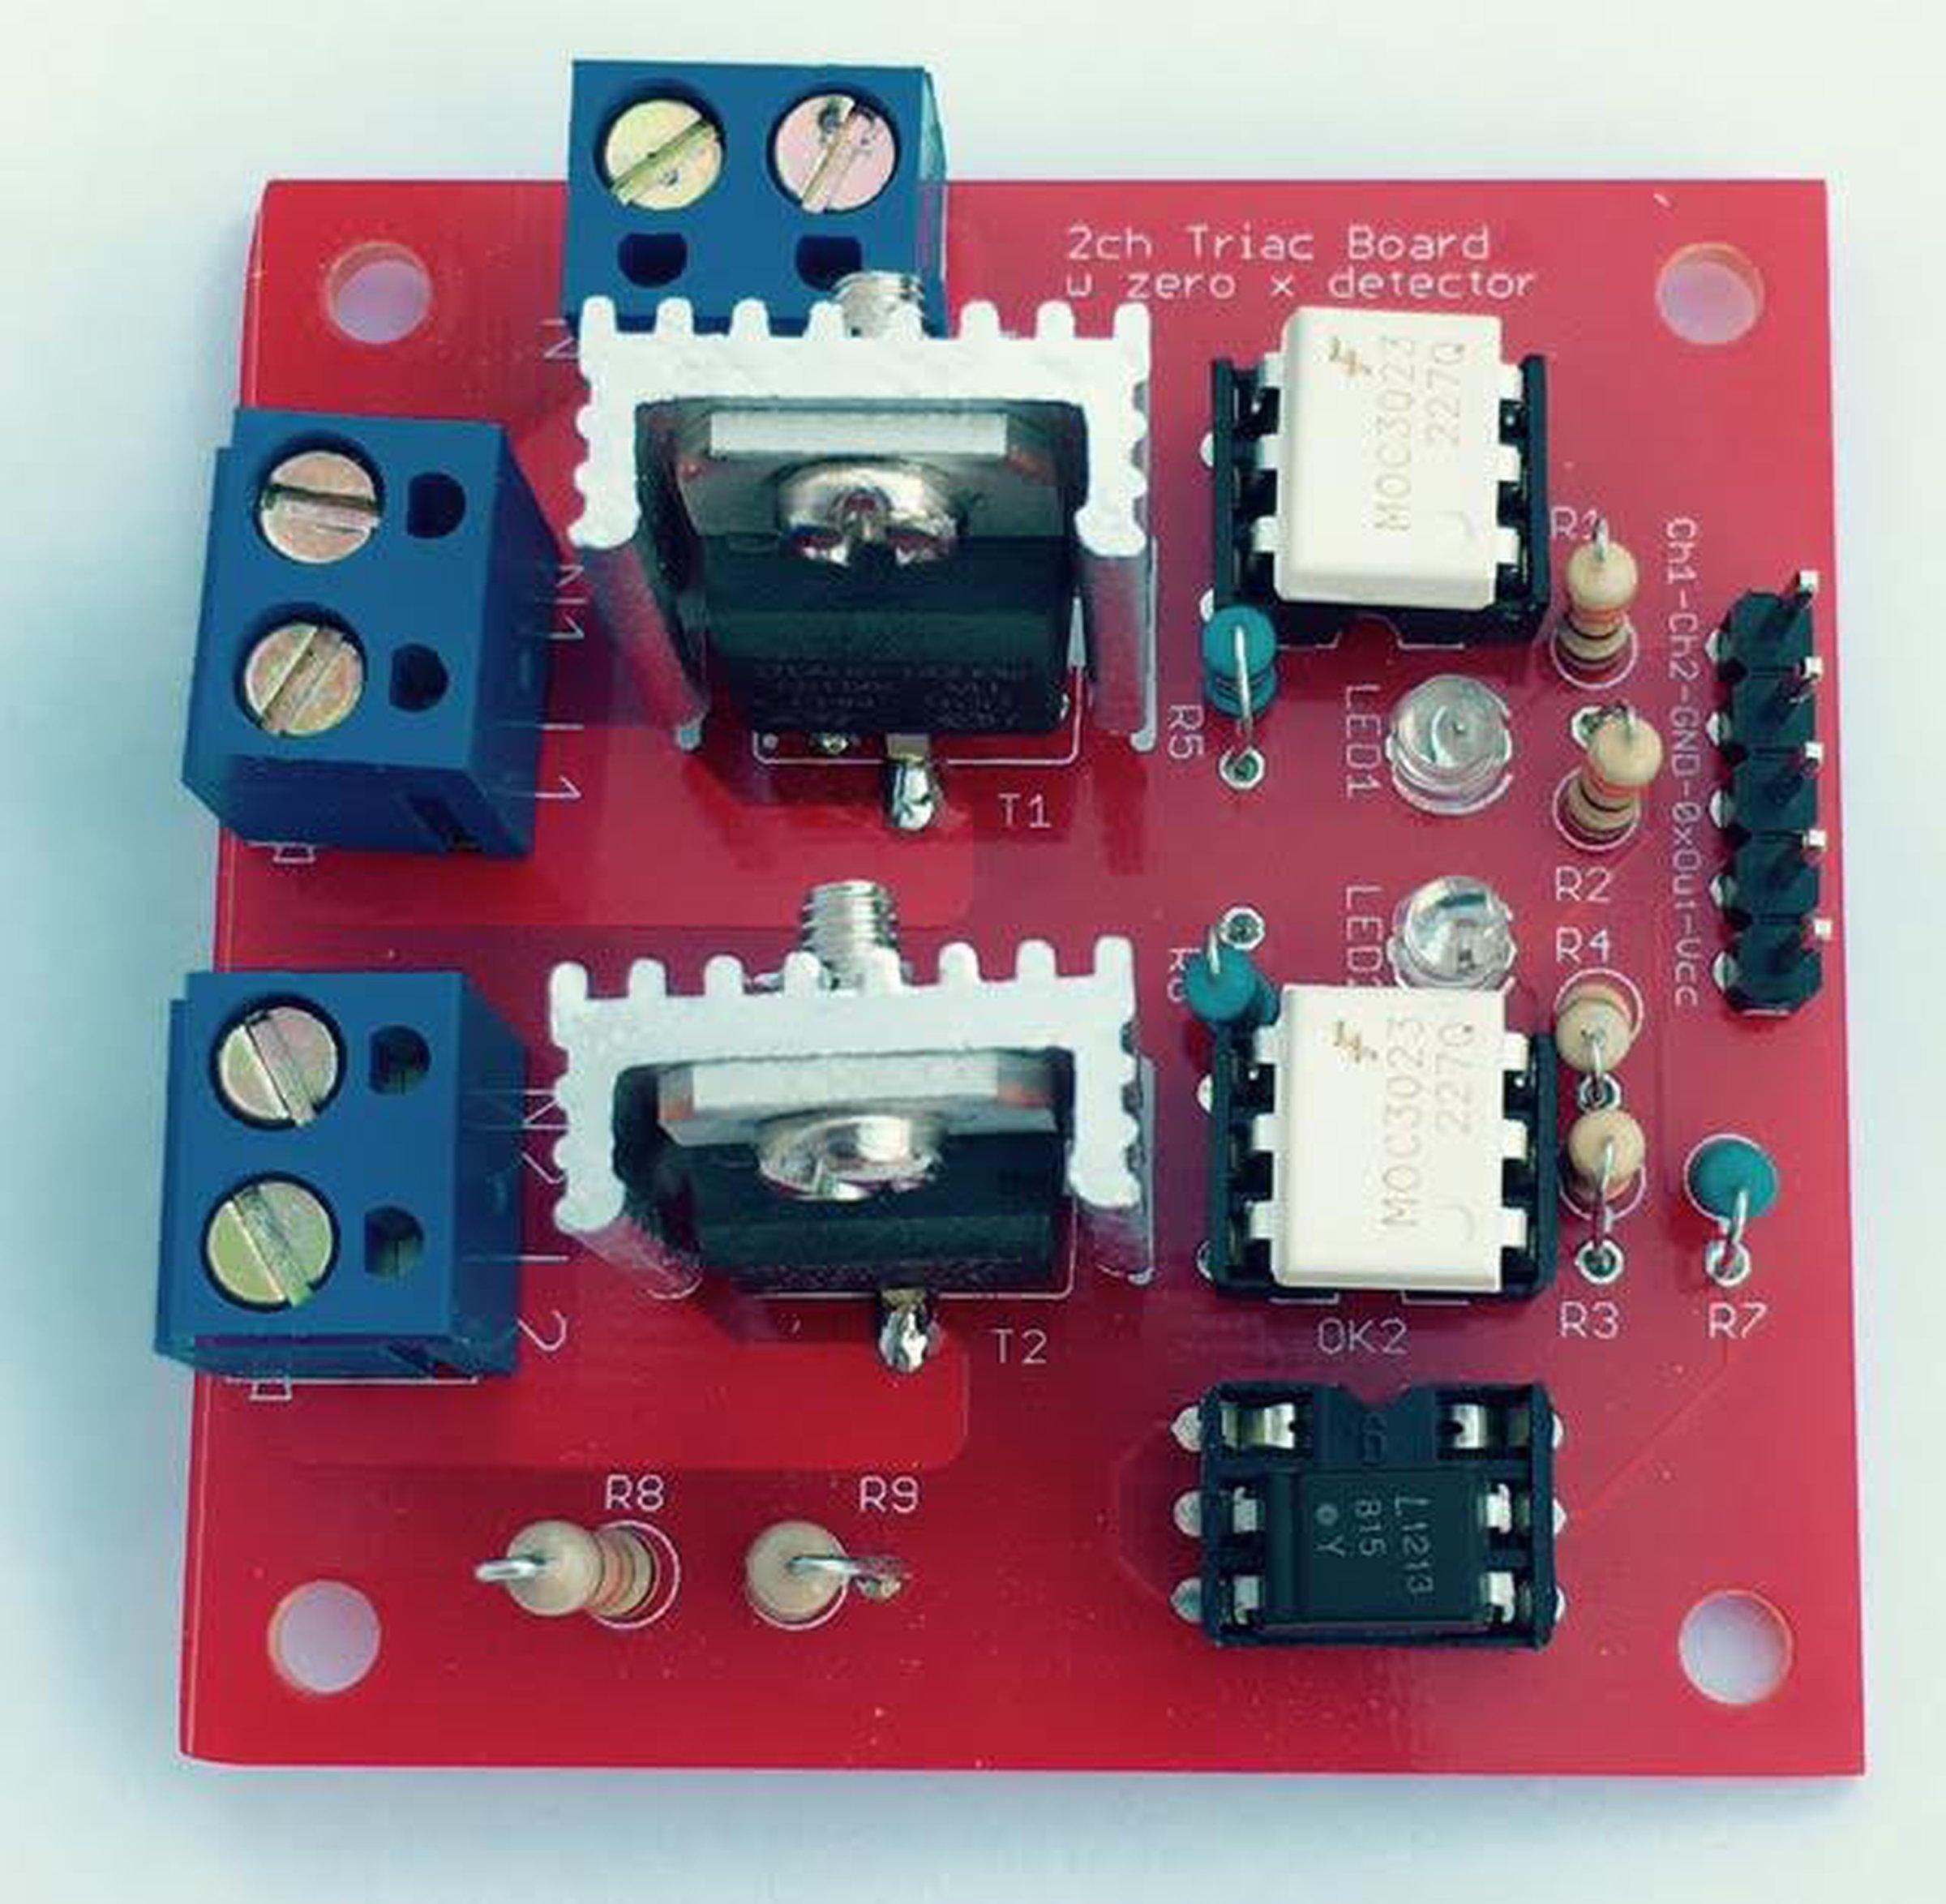 2 Ch Triac Board W Zero Crossing Detector Pcb From Robg On Tindie Opto Circuit 1